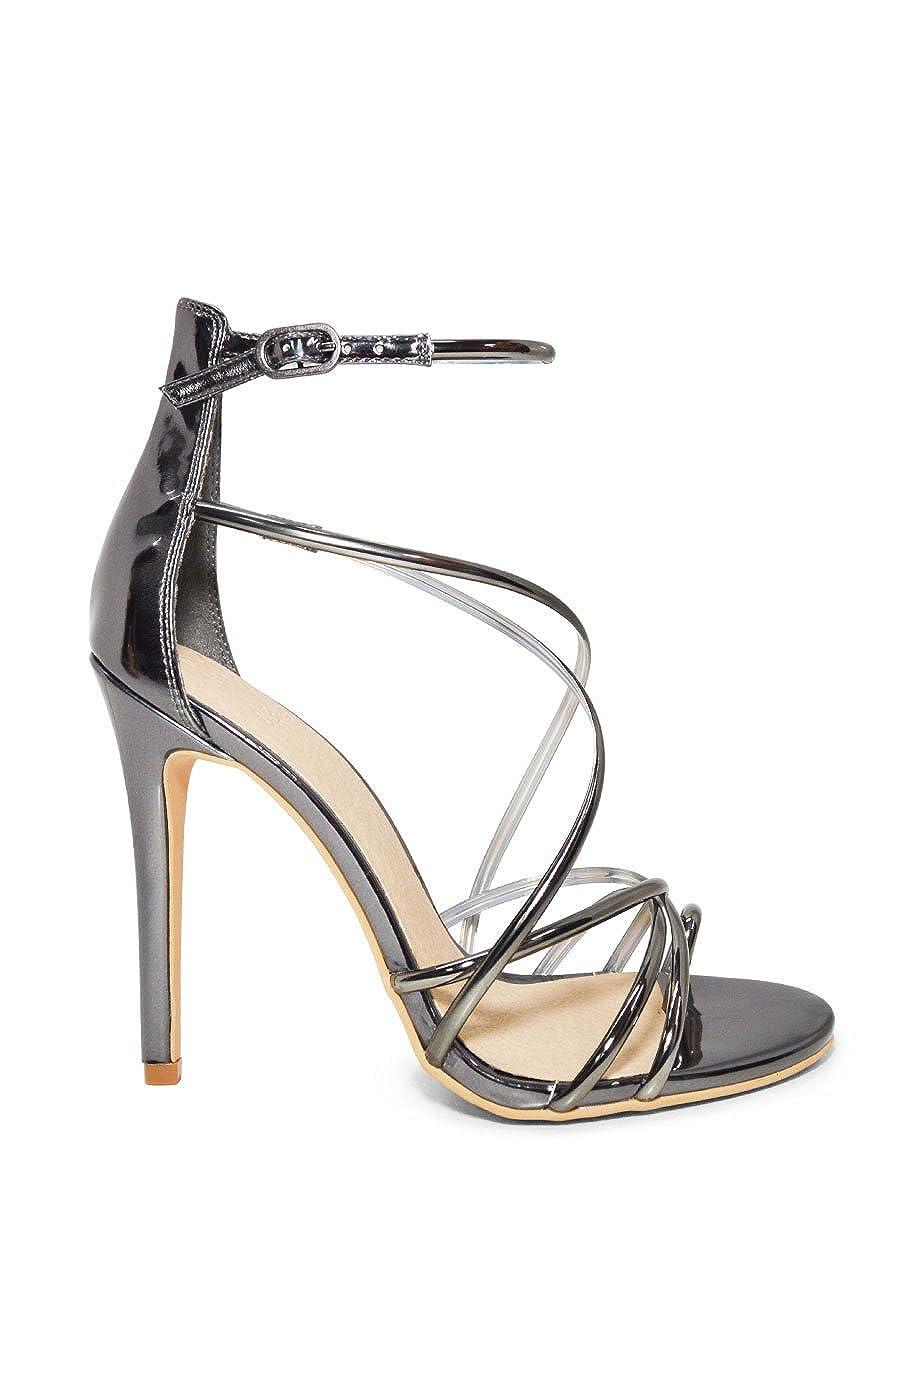 25ee3846896 Beast Fashion Pia-01 Pewter Stiletto High Heel Sandal